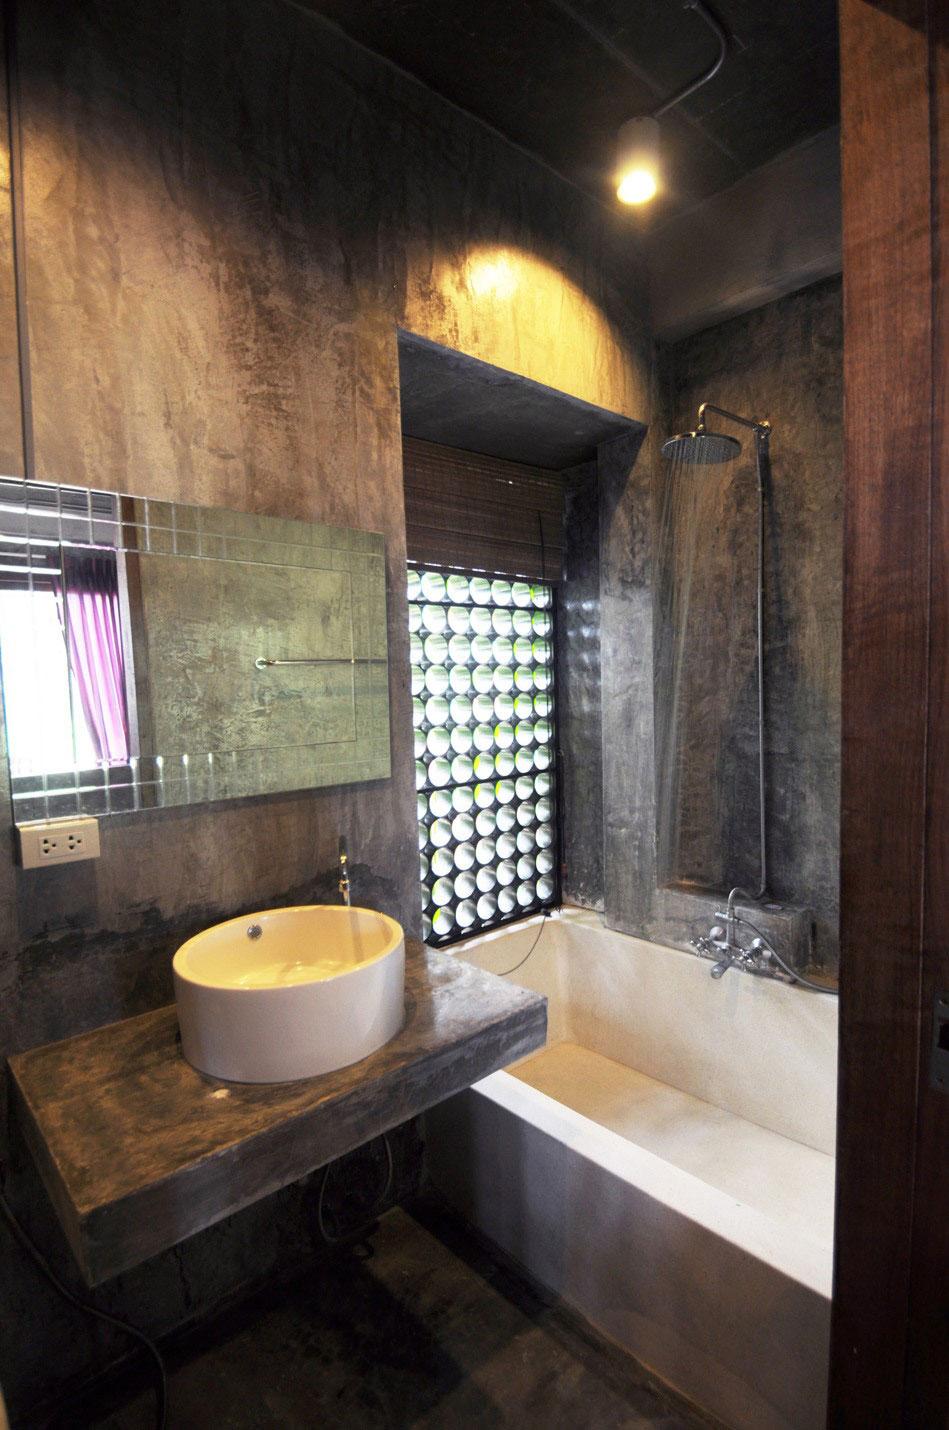 Casa peque a y econ mica de hormig n de dos pisos for Disenos de banos para casas pequenas